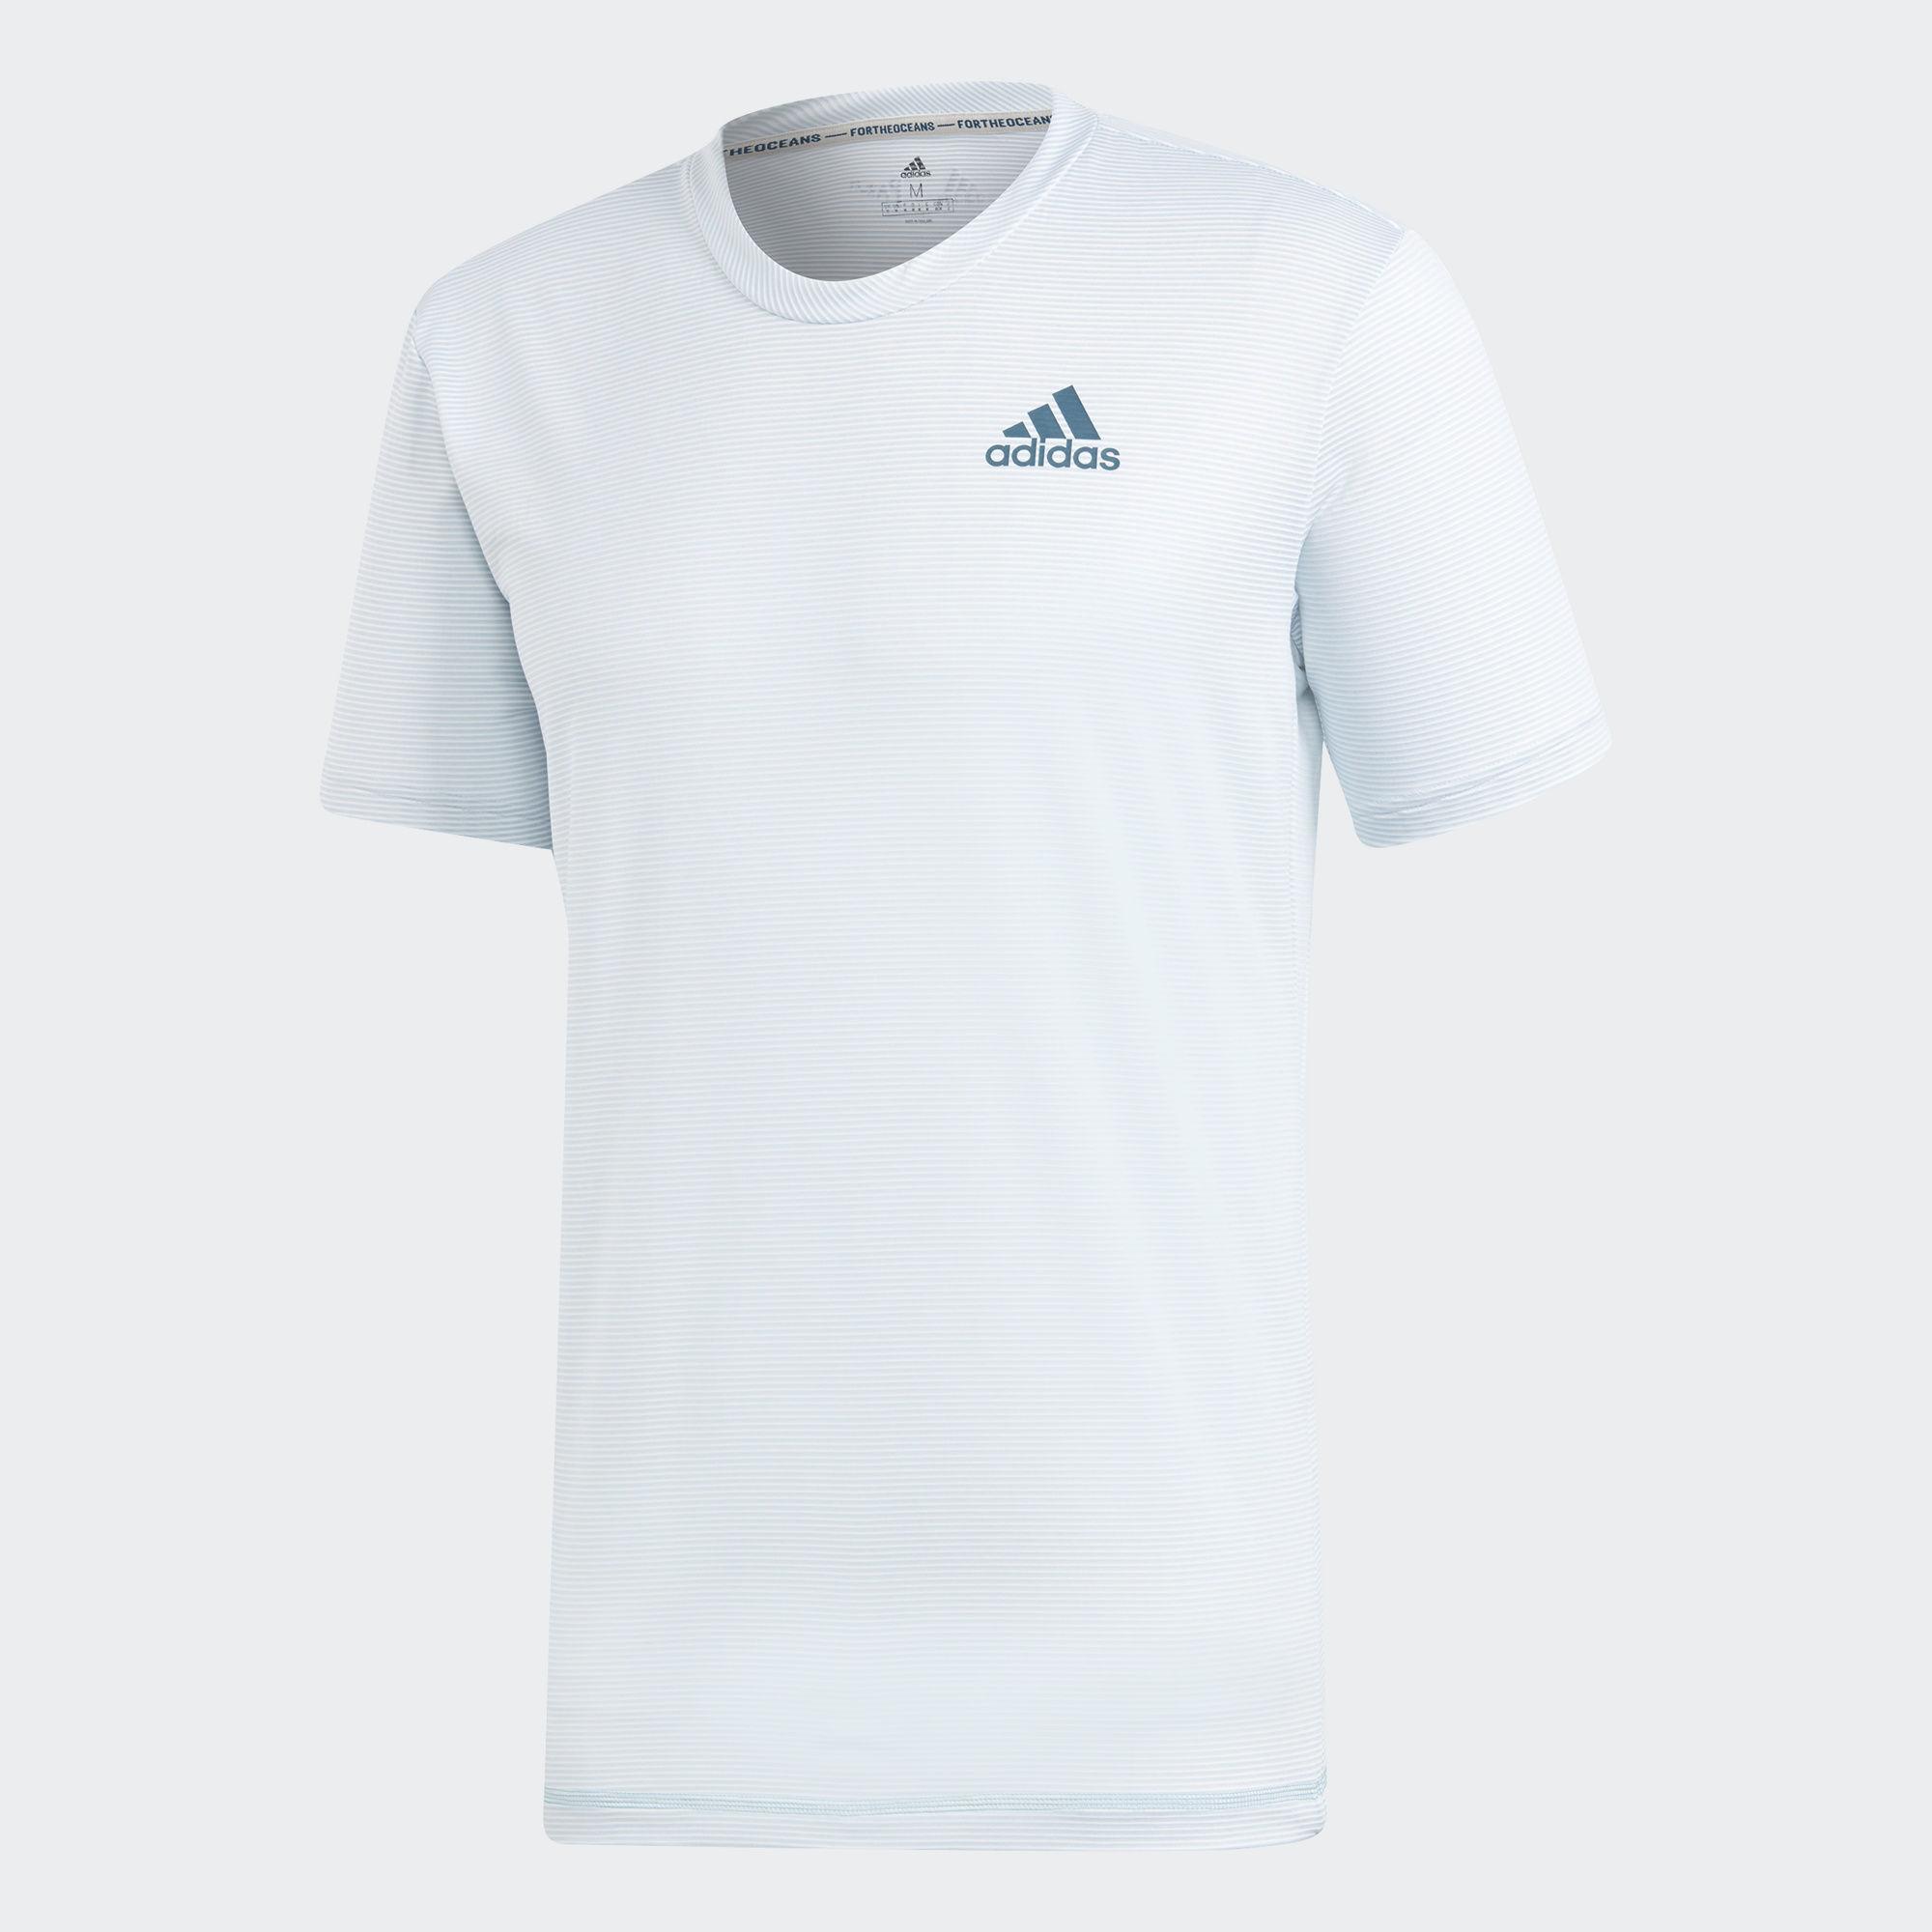 39842f3aba Adidas Mens Parley Striped Tee - White